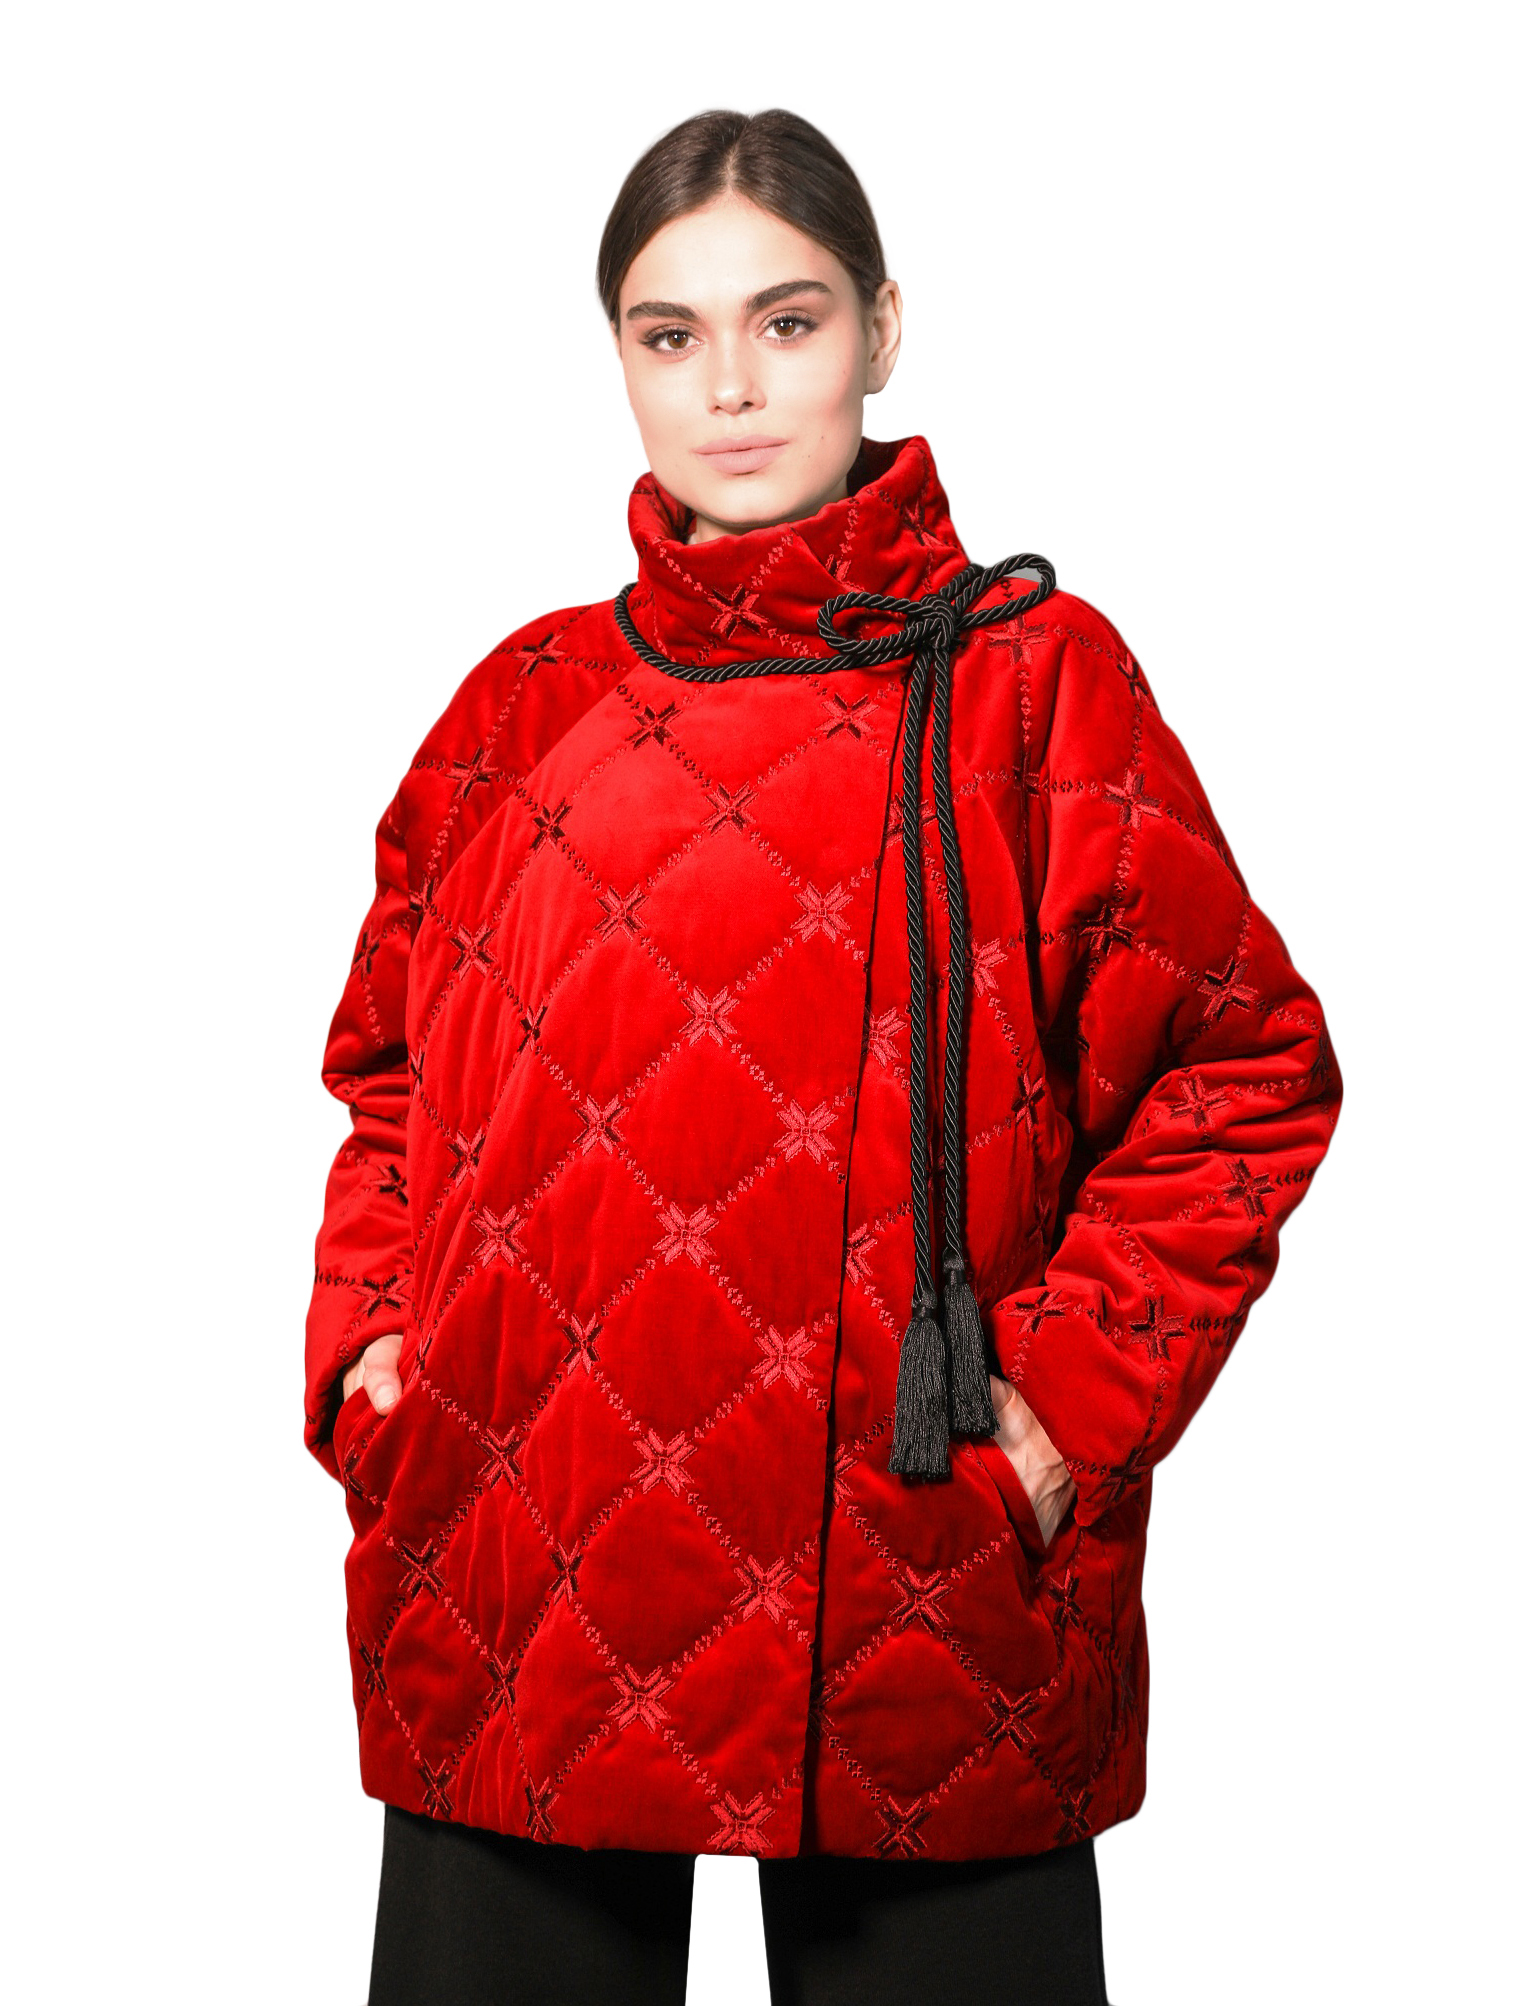 Velvet bomber jacket with embroidery